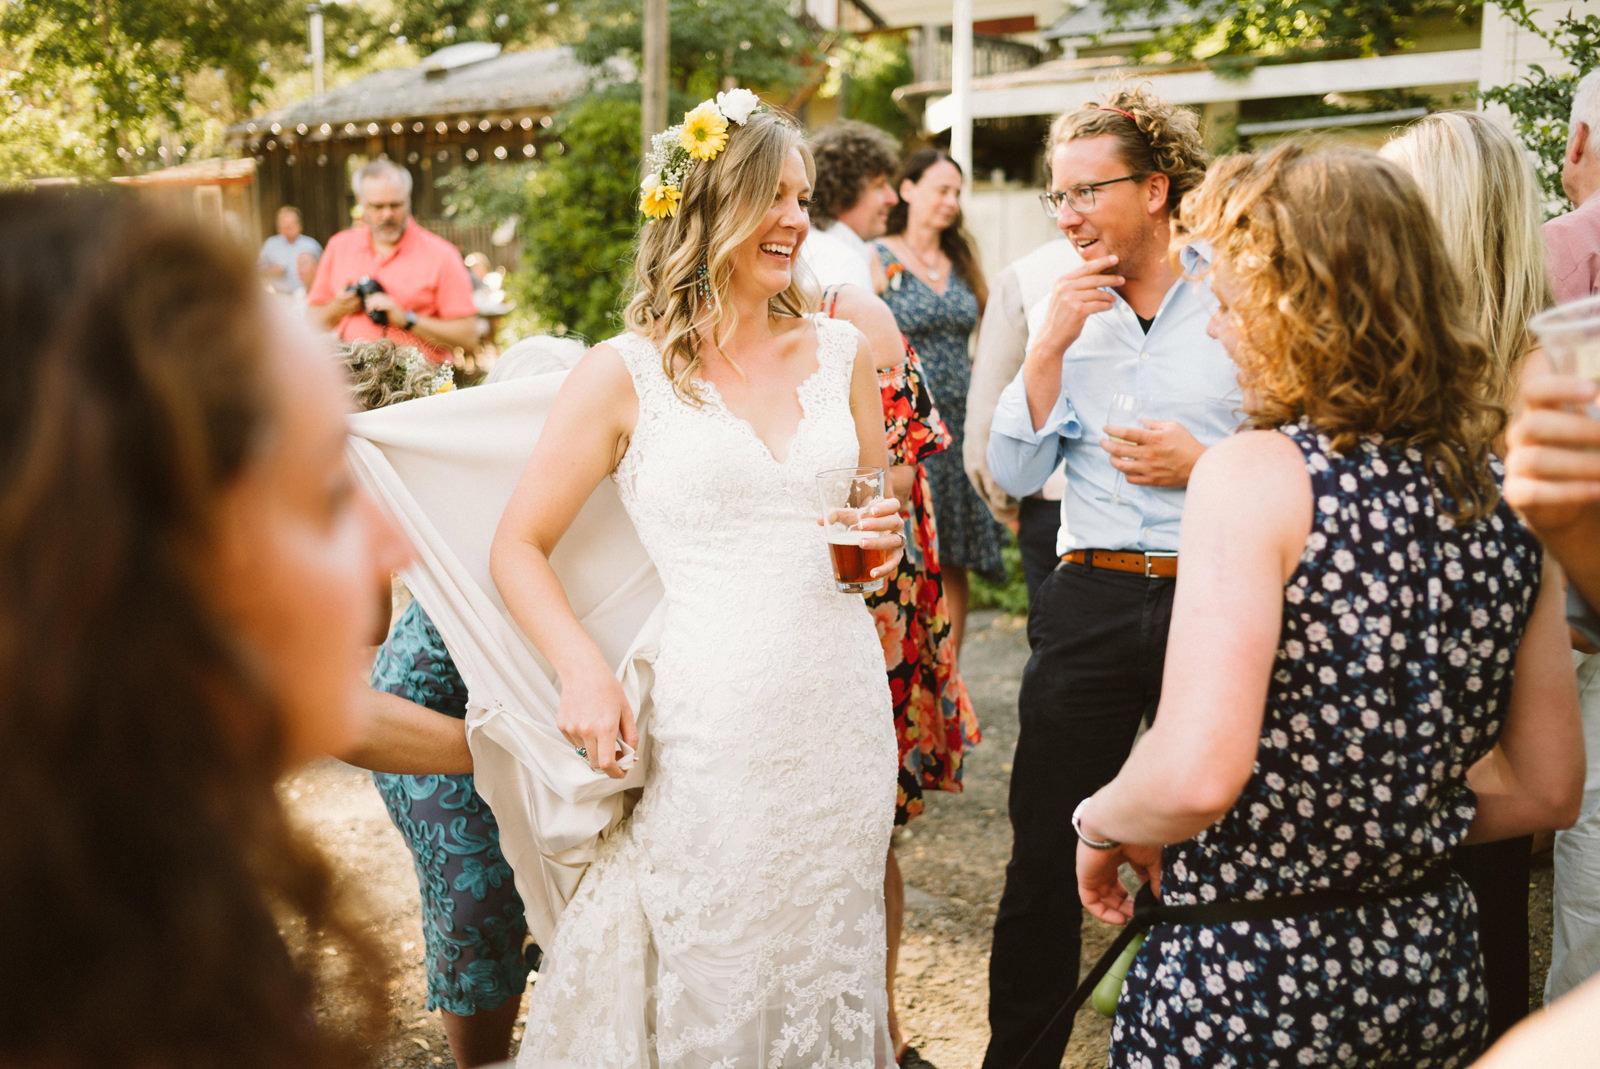 rivers-bend-retreat-wedding-064 RIVER'S BEND RETREAT WEDDING